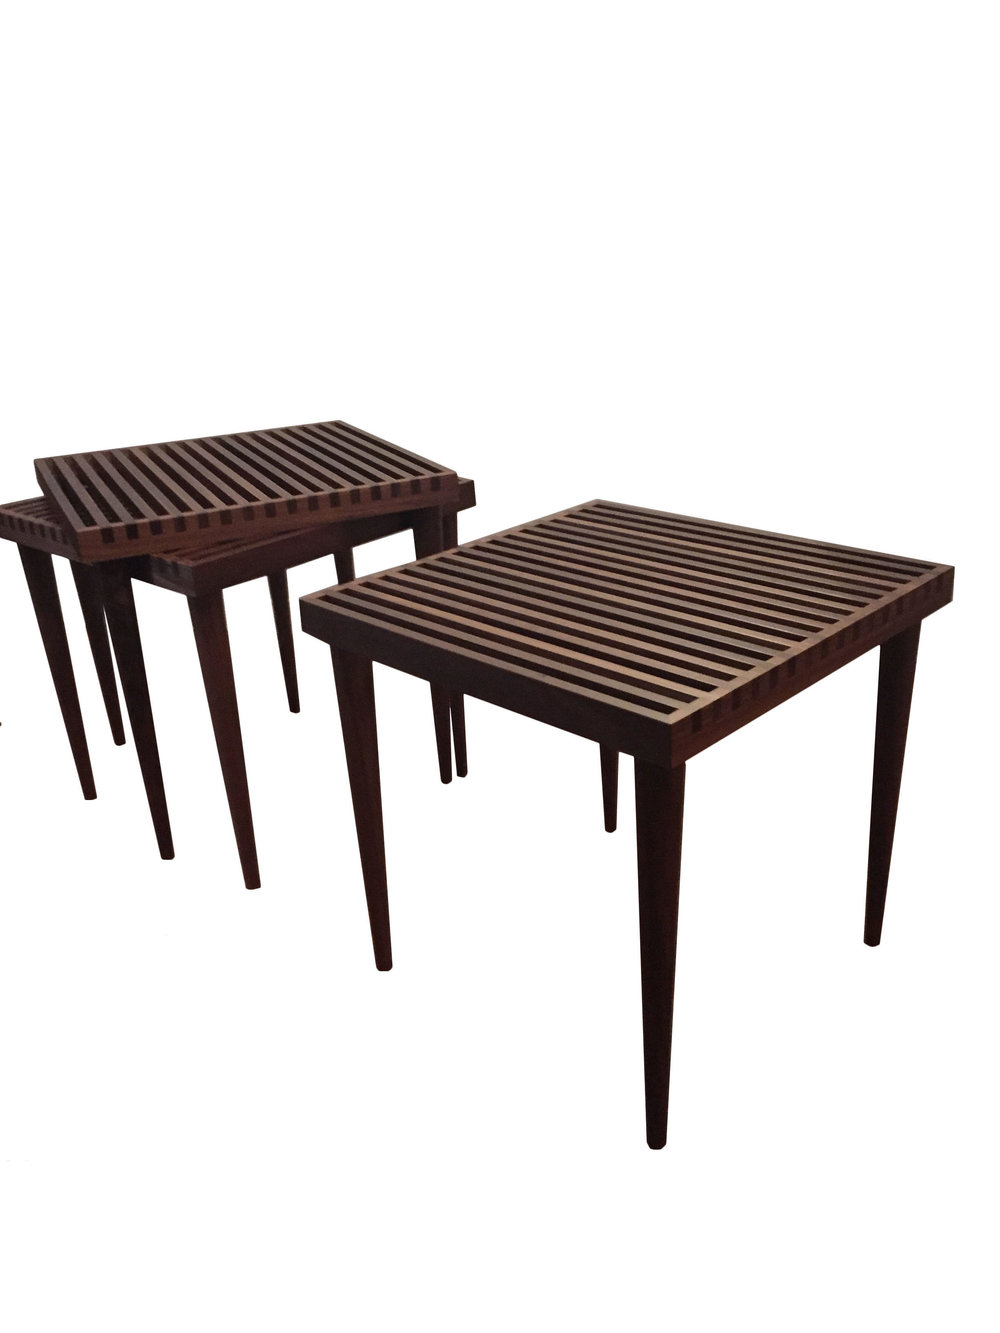 smilow-furniture-slatted-stacking-table-2-1.jpg